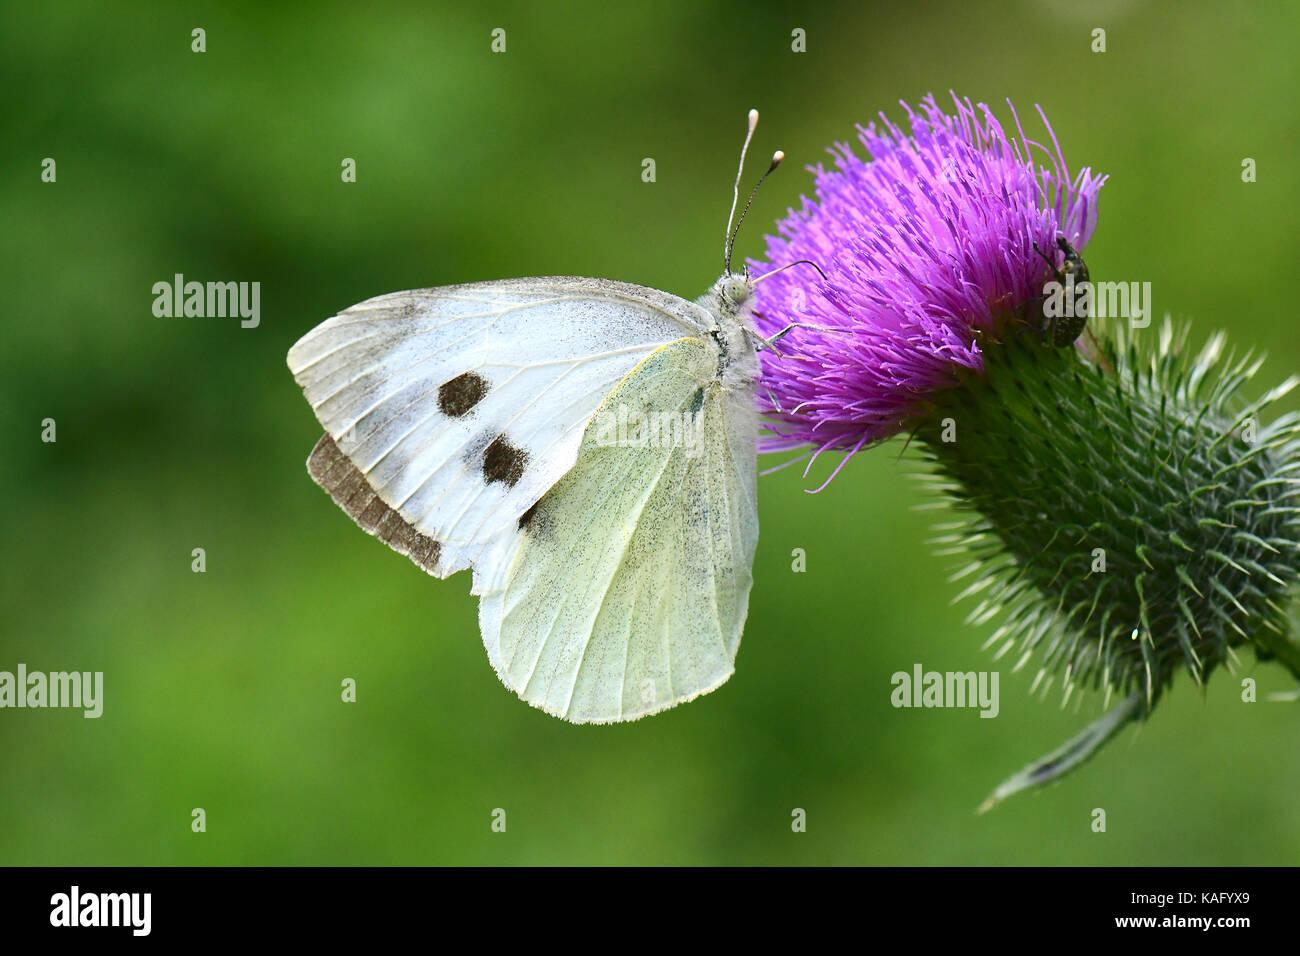 Large White (Pieris rapae), sucking nectar from flowering Thistle (Cirsium sp.). - Stock Image